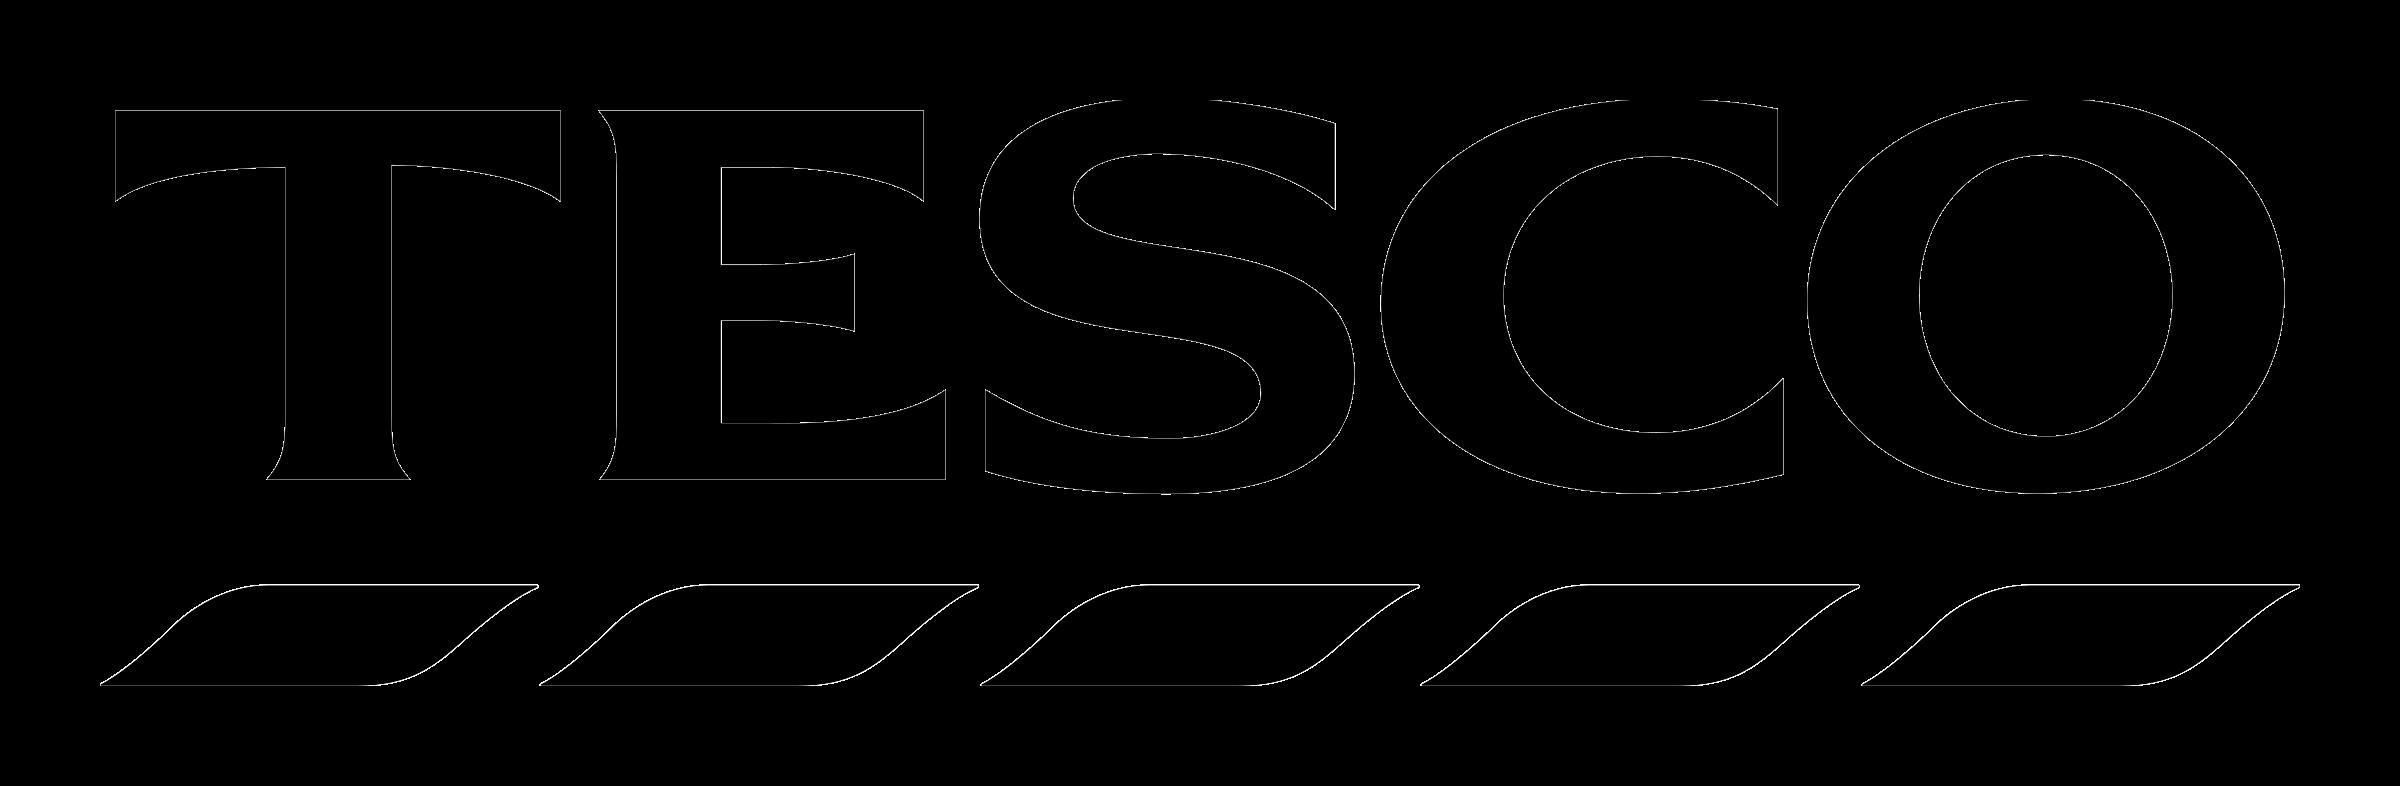 tesco-logo-black-and-white.png